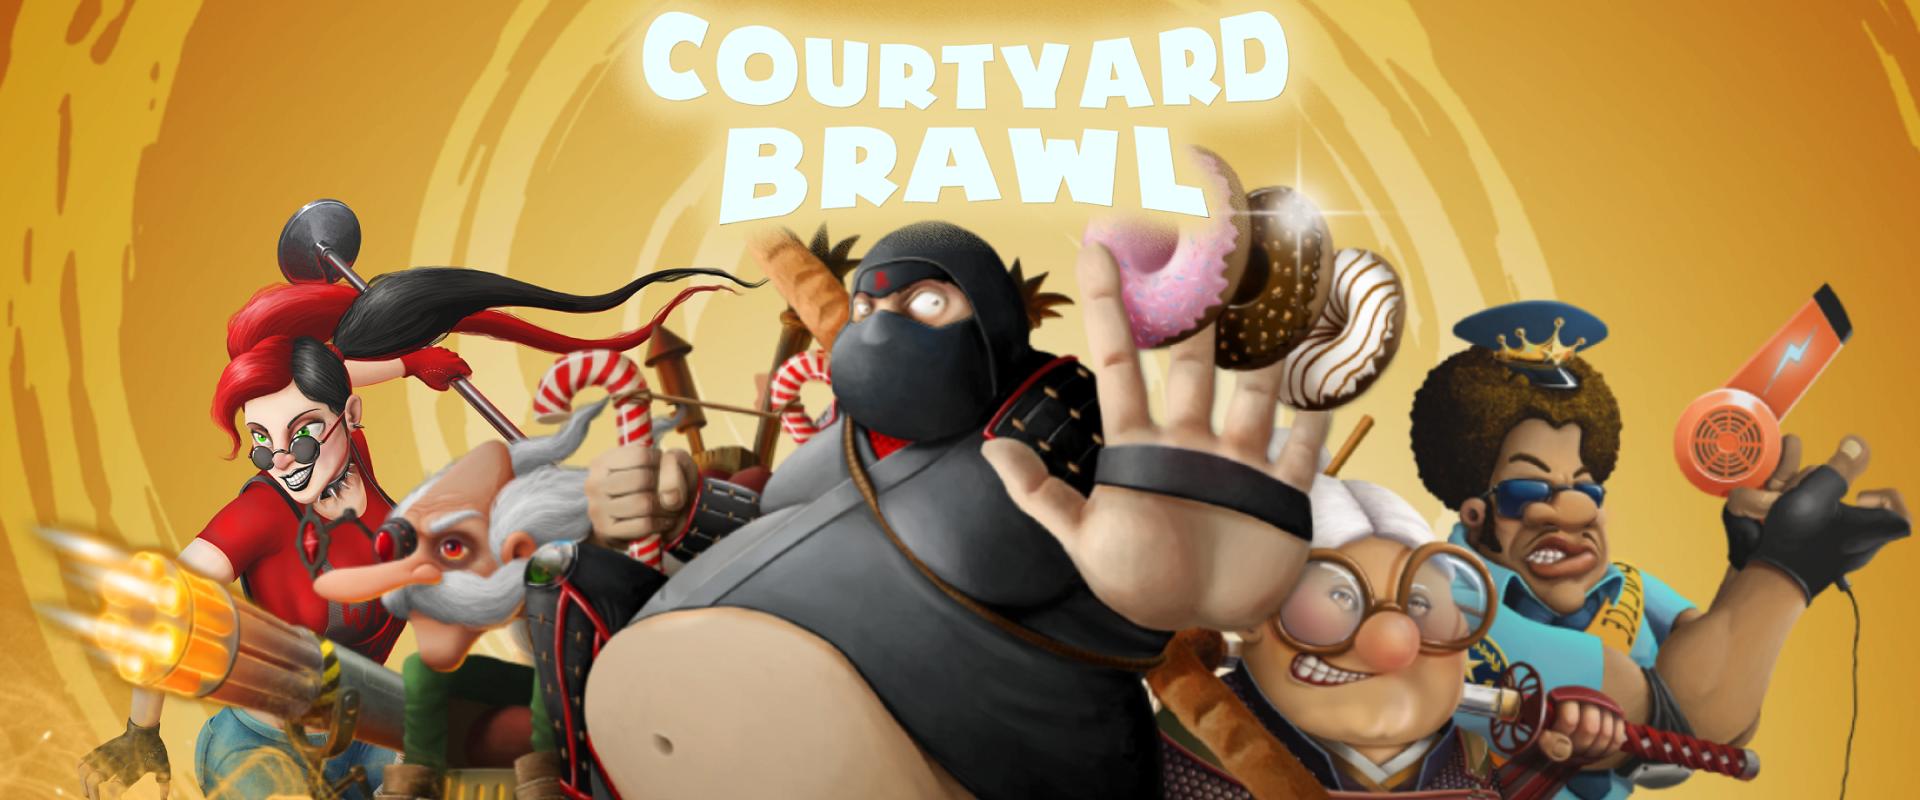 Courtyard Brawl - Random Tower Defense